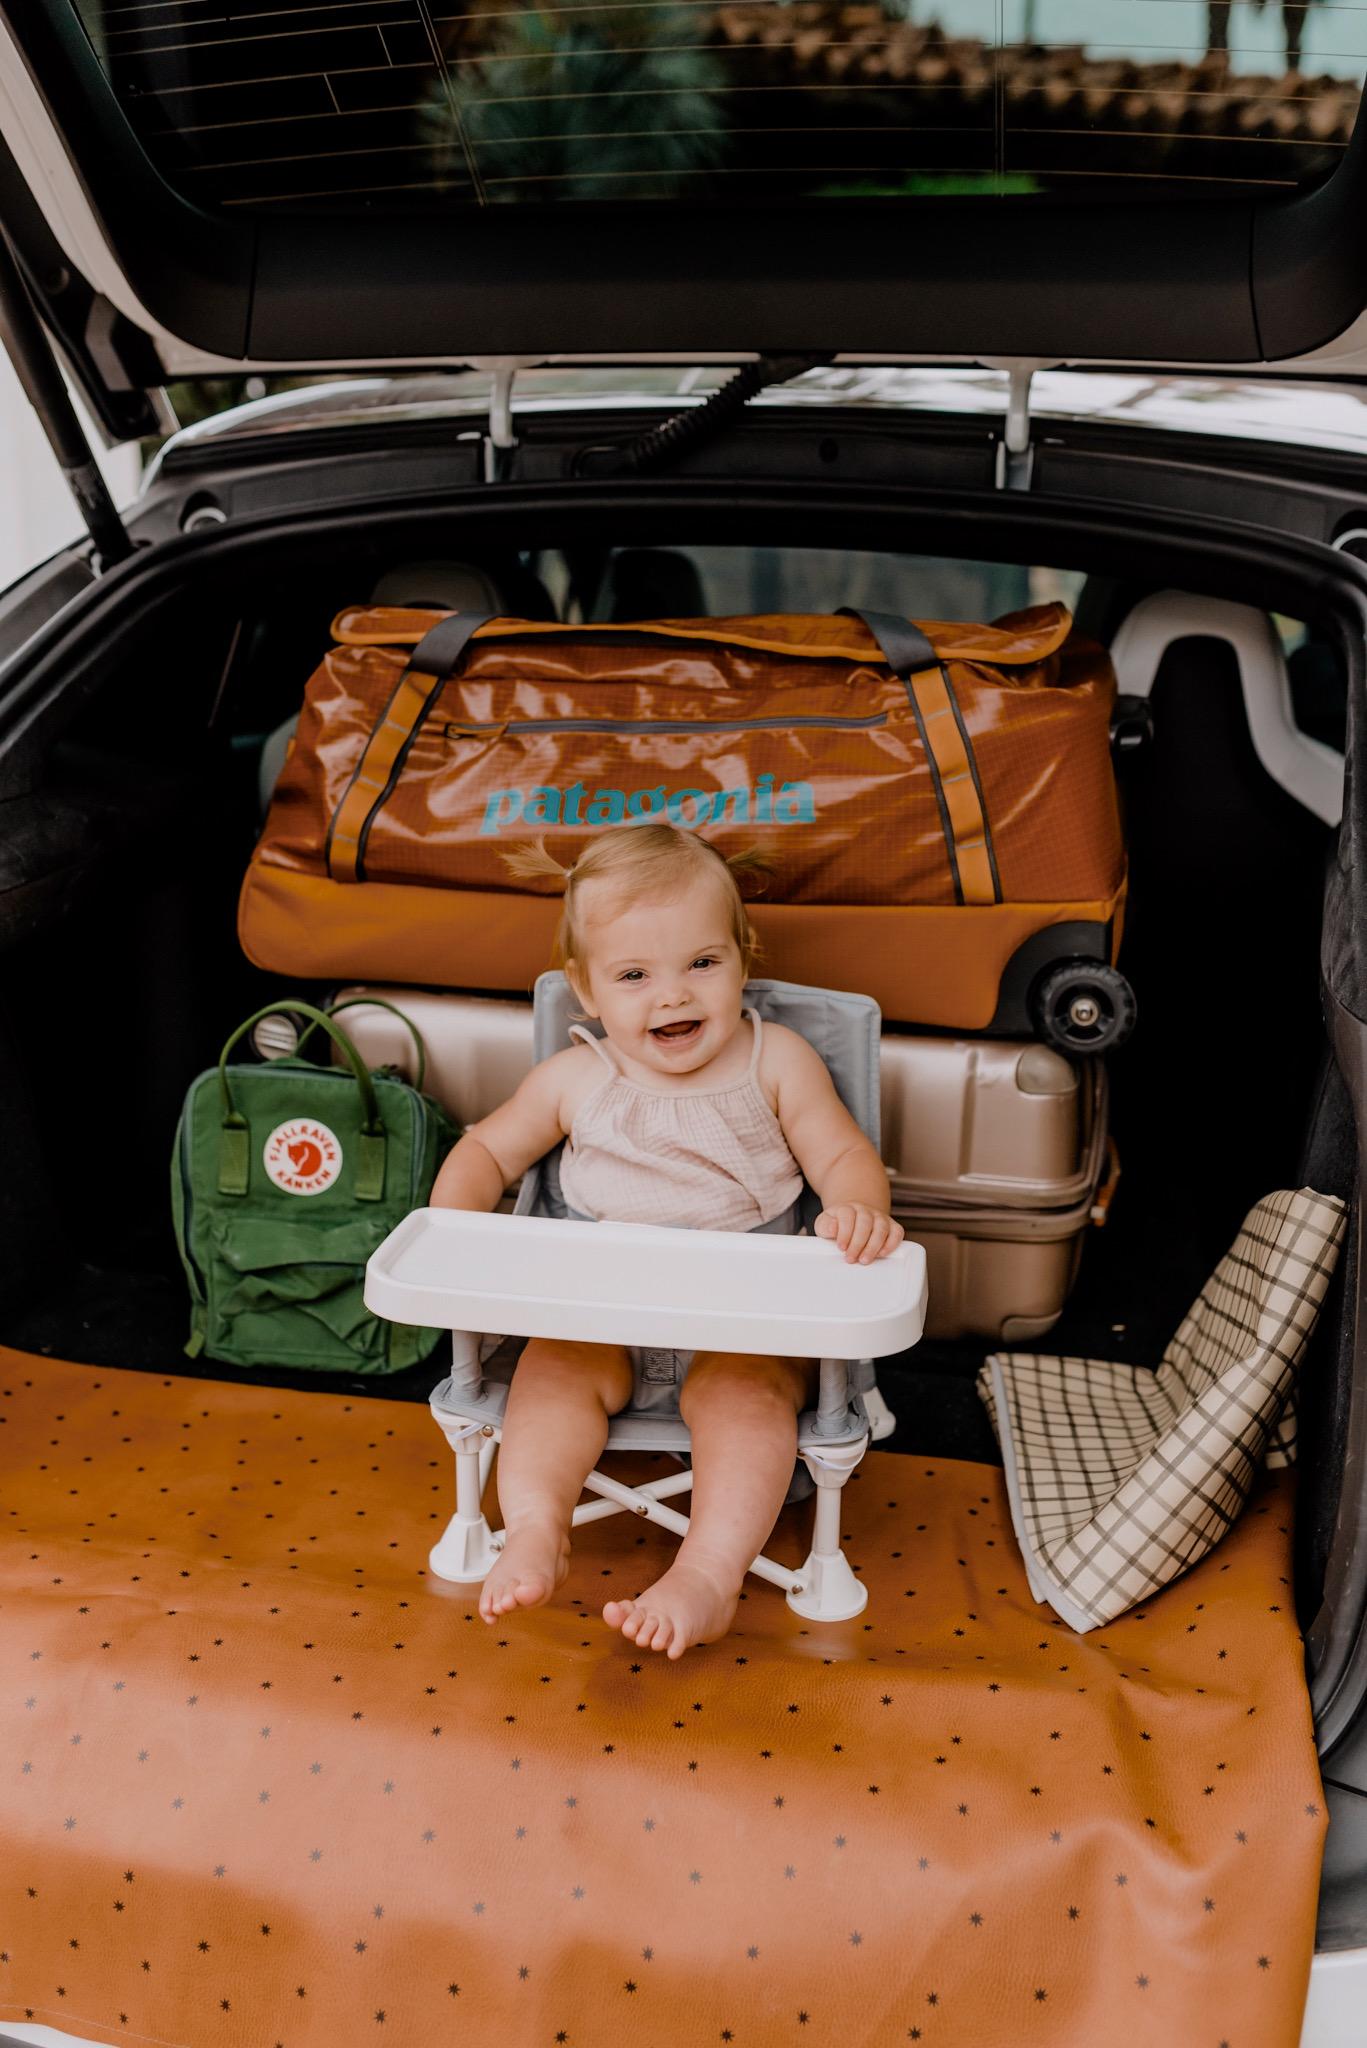 Travel Essentials for Kids - Portable High Chair, Patagonia luggage, gathre mat